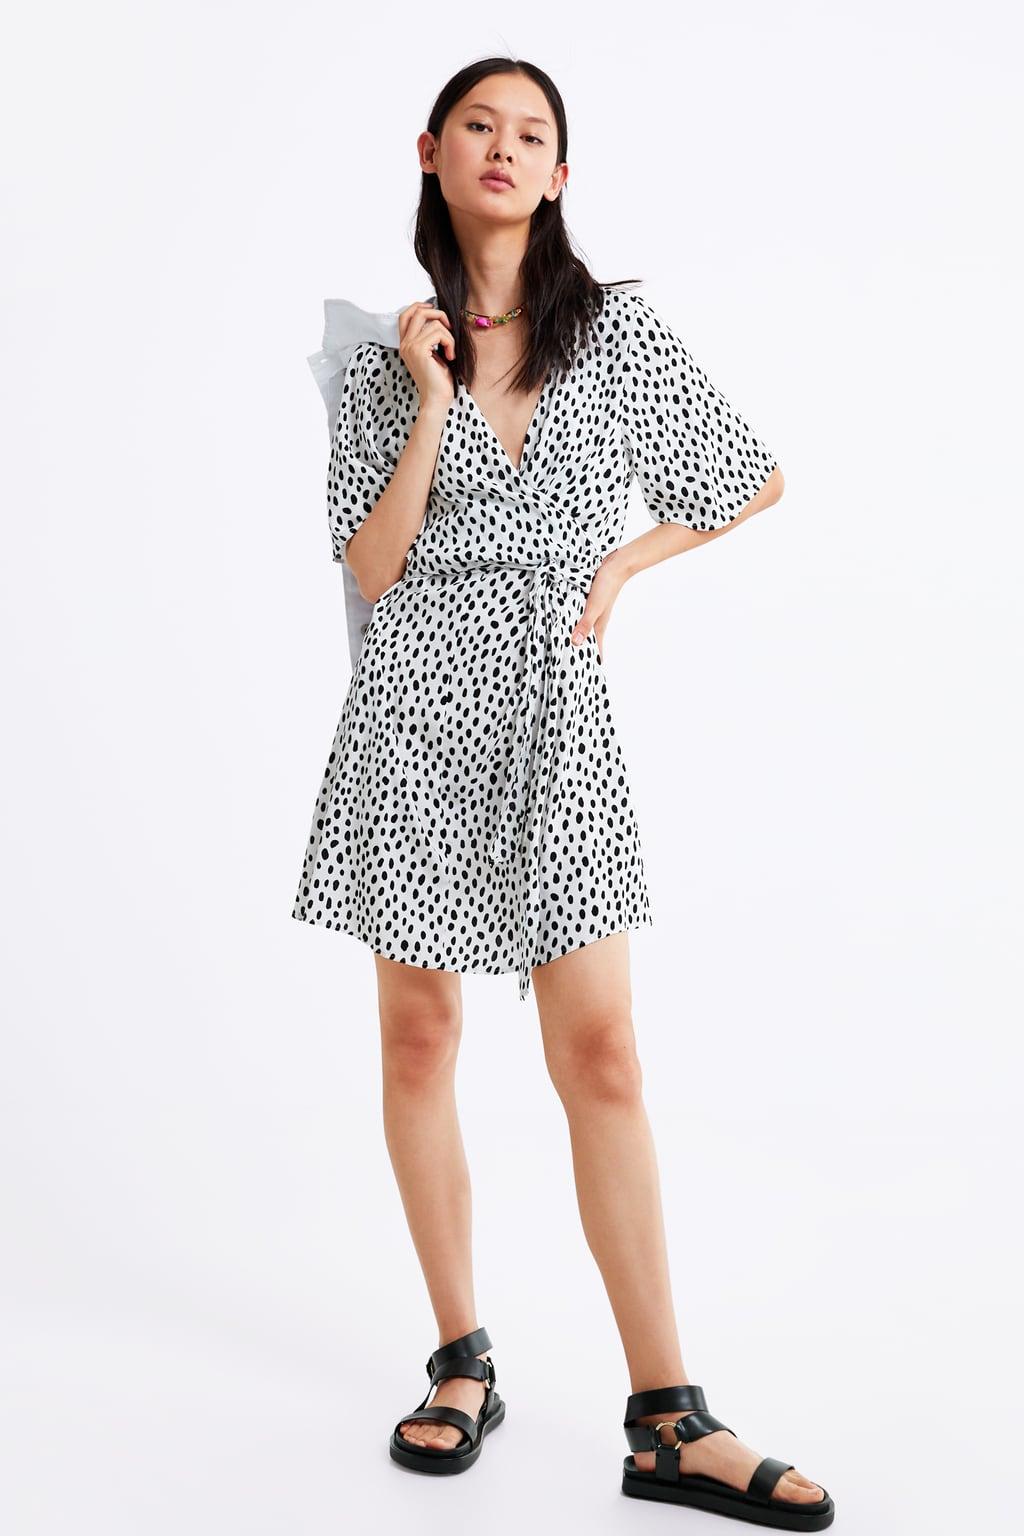 d07685cd POLKA DOT DRESS WITH TIED DETAIL-DRESSES-WOMAN-SALE | ZARA Singapore